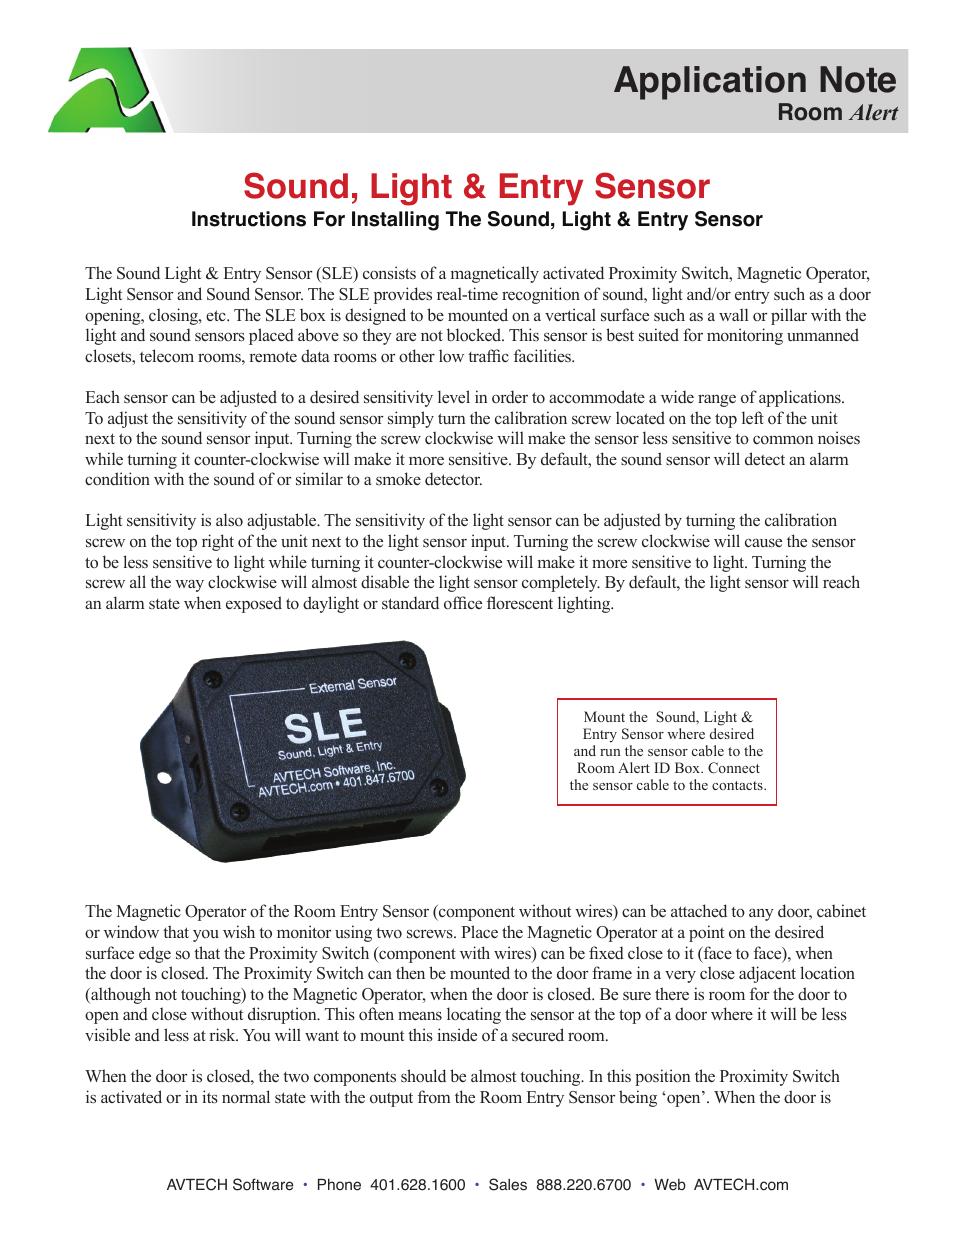 Avtech Sound Light Entry Sensor Rma Sle Sen User Manual 2 Pages